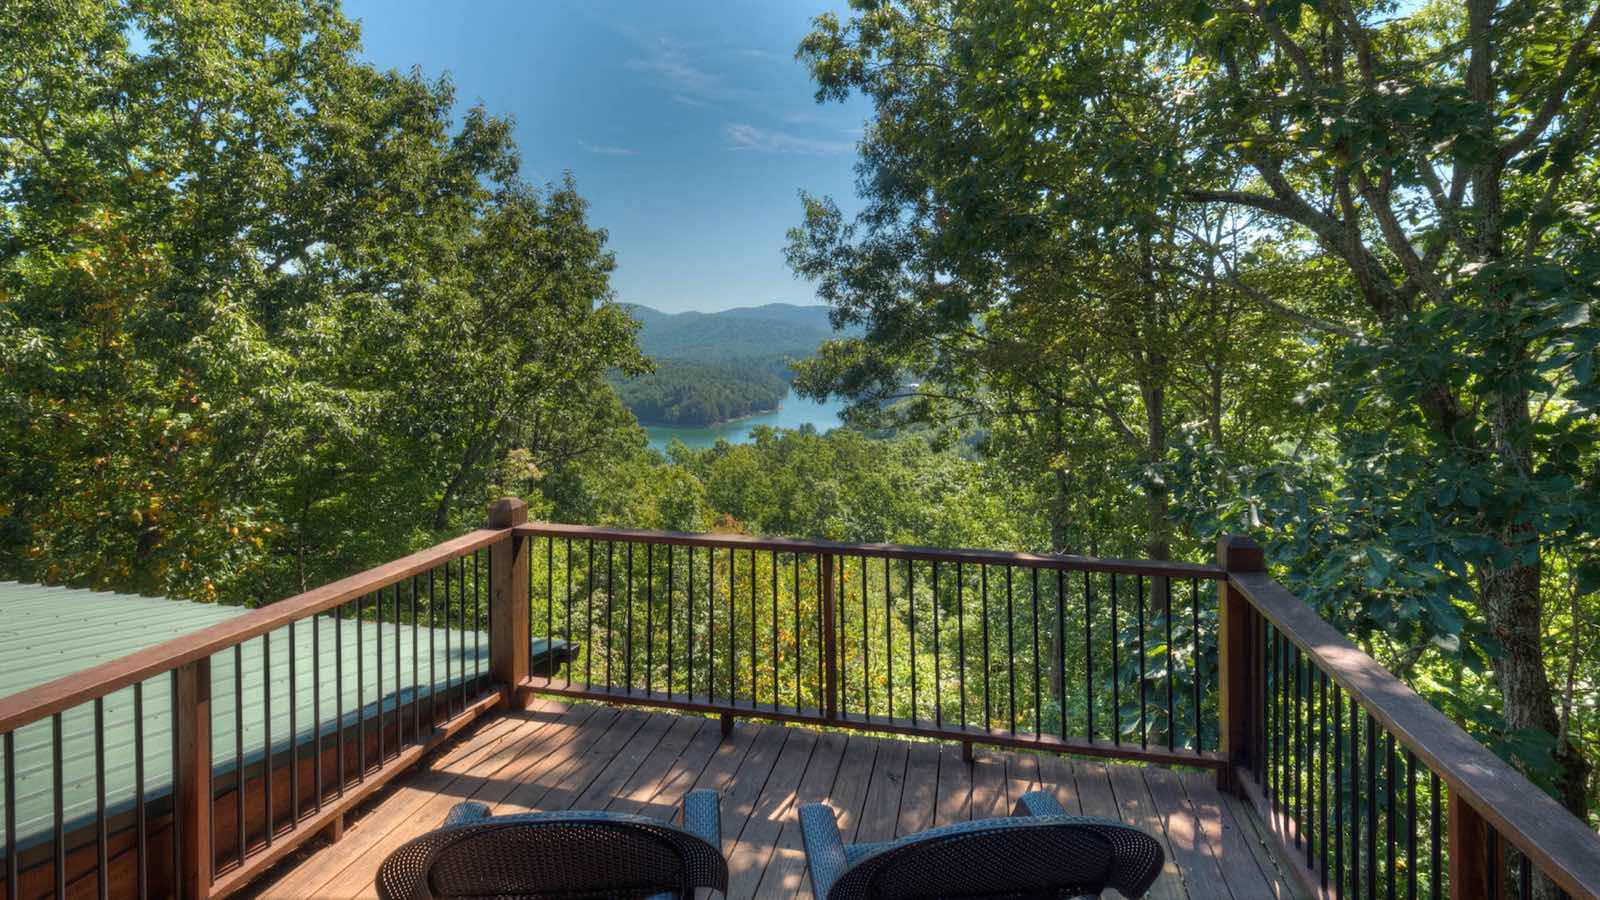 My Blue Ridge Travel Guide